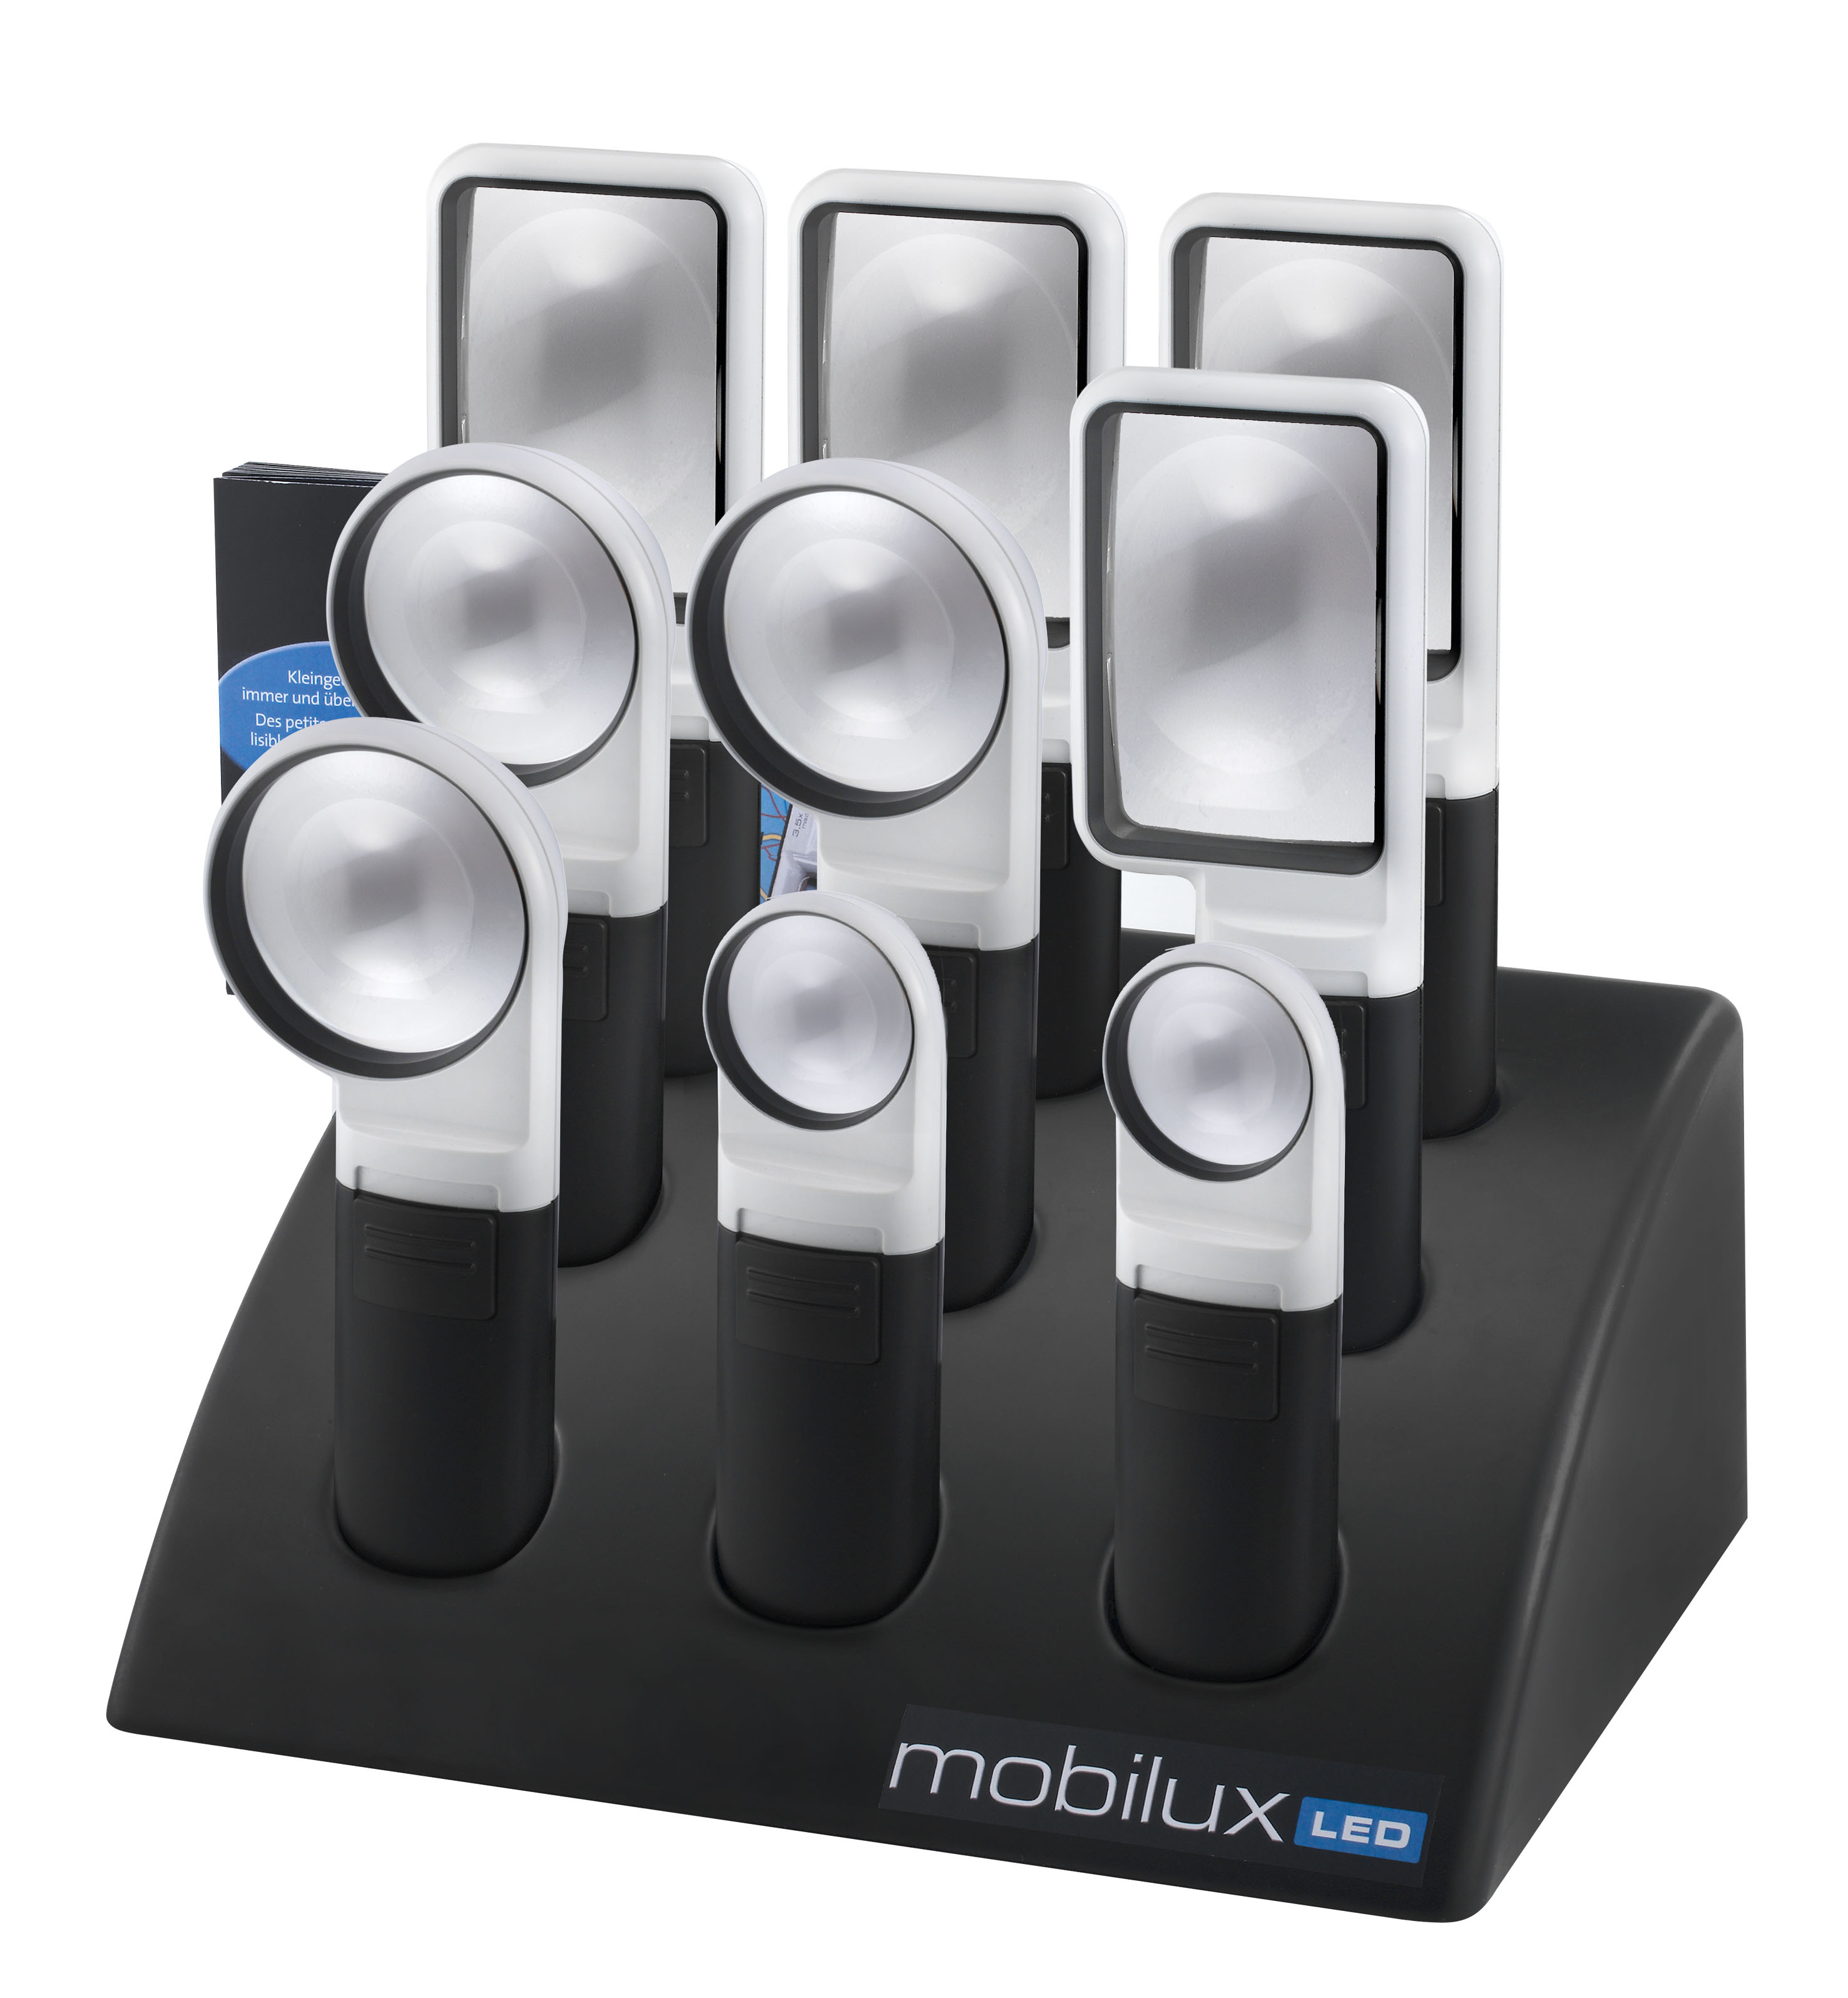 Eschenbach Mobilux LED Display